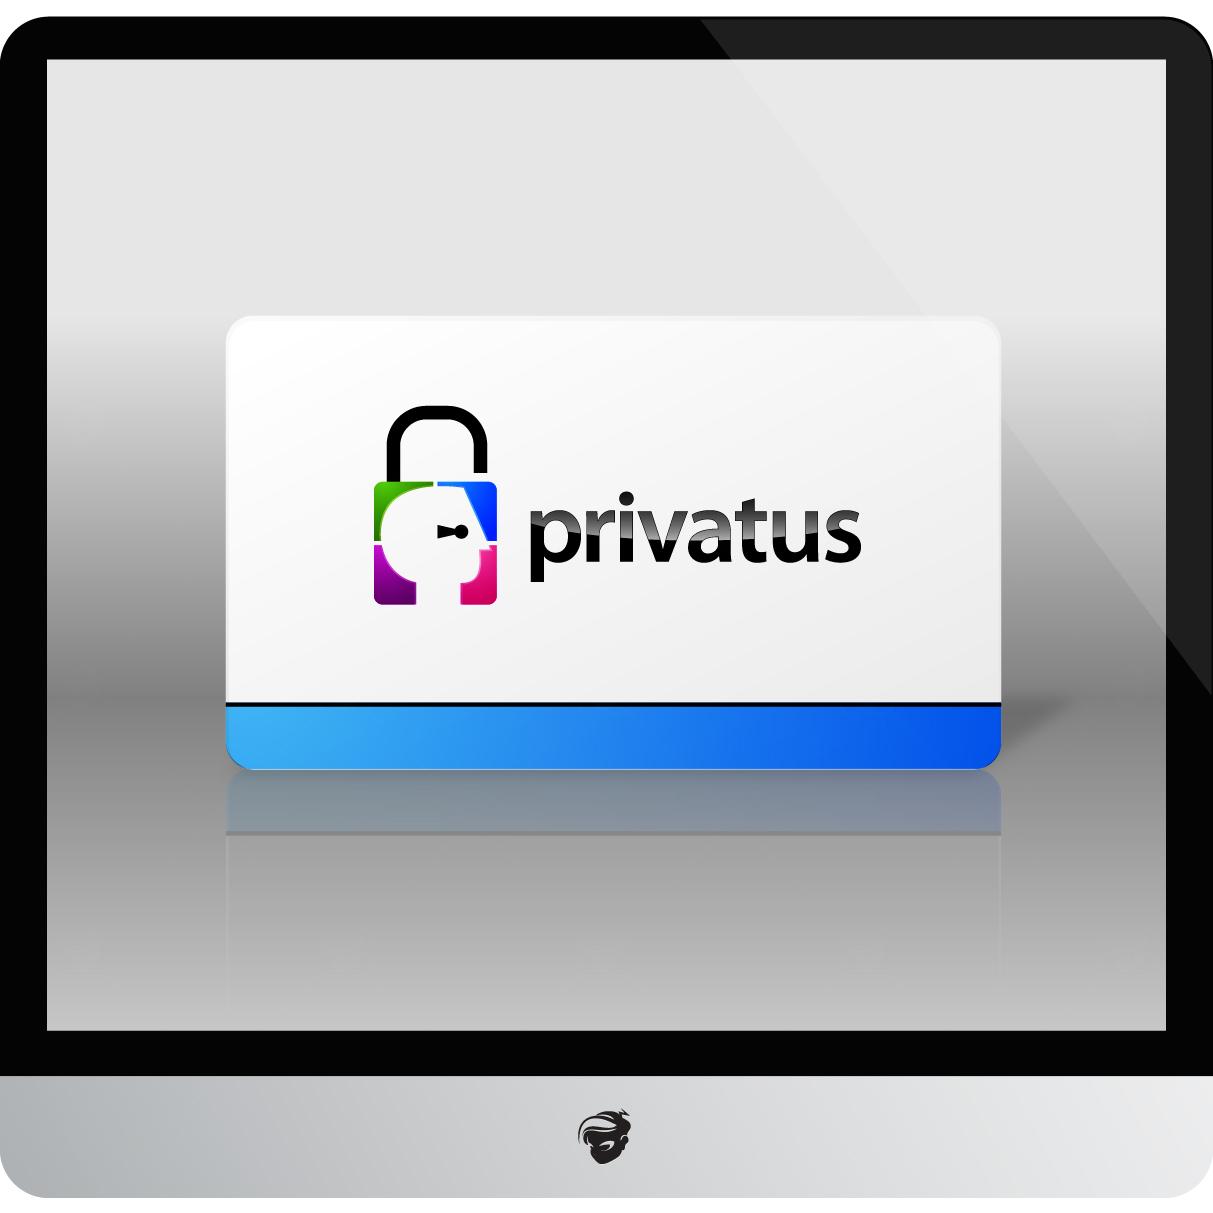 Logo Design by zesthar - Entry No. 190 in the Logo Design Contest New Logo Design for privatus.